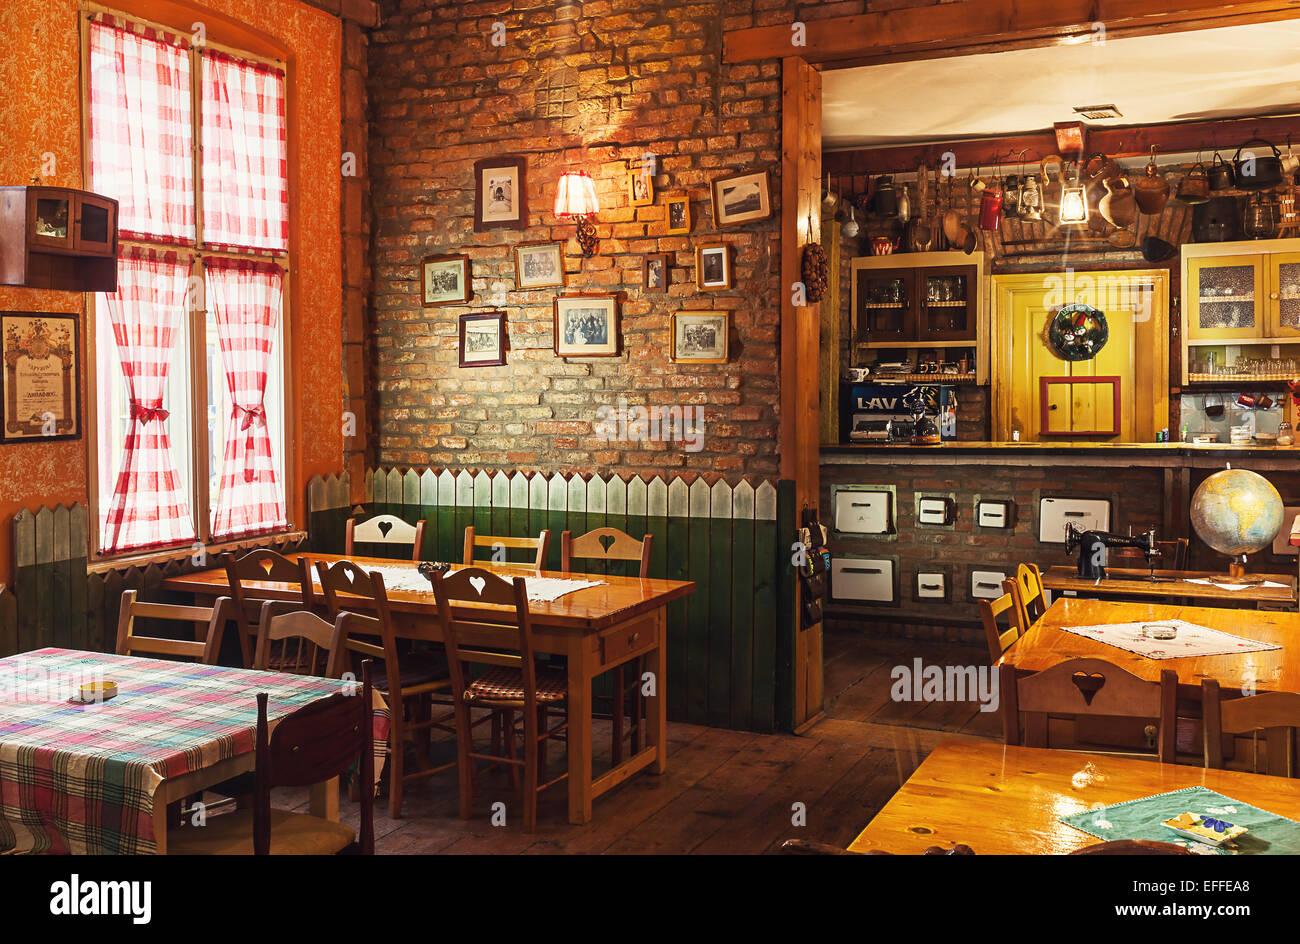 Cacak Serbia December 06 2014 Cafe And Restaurant Interior